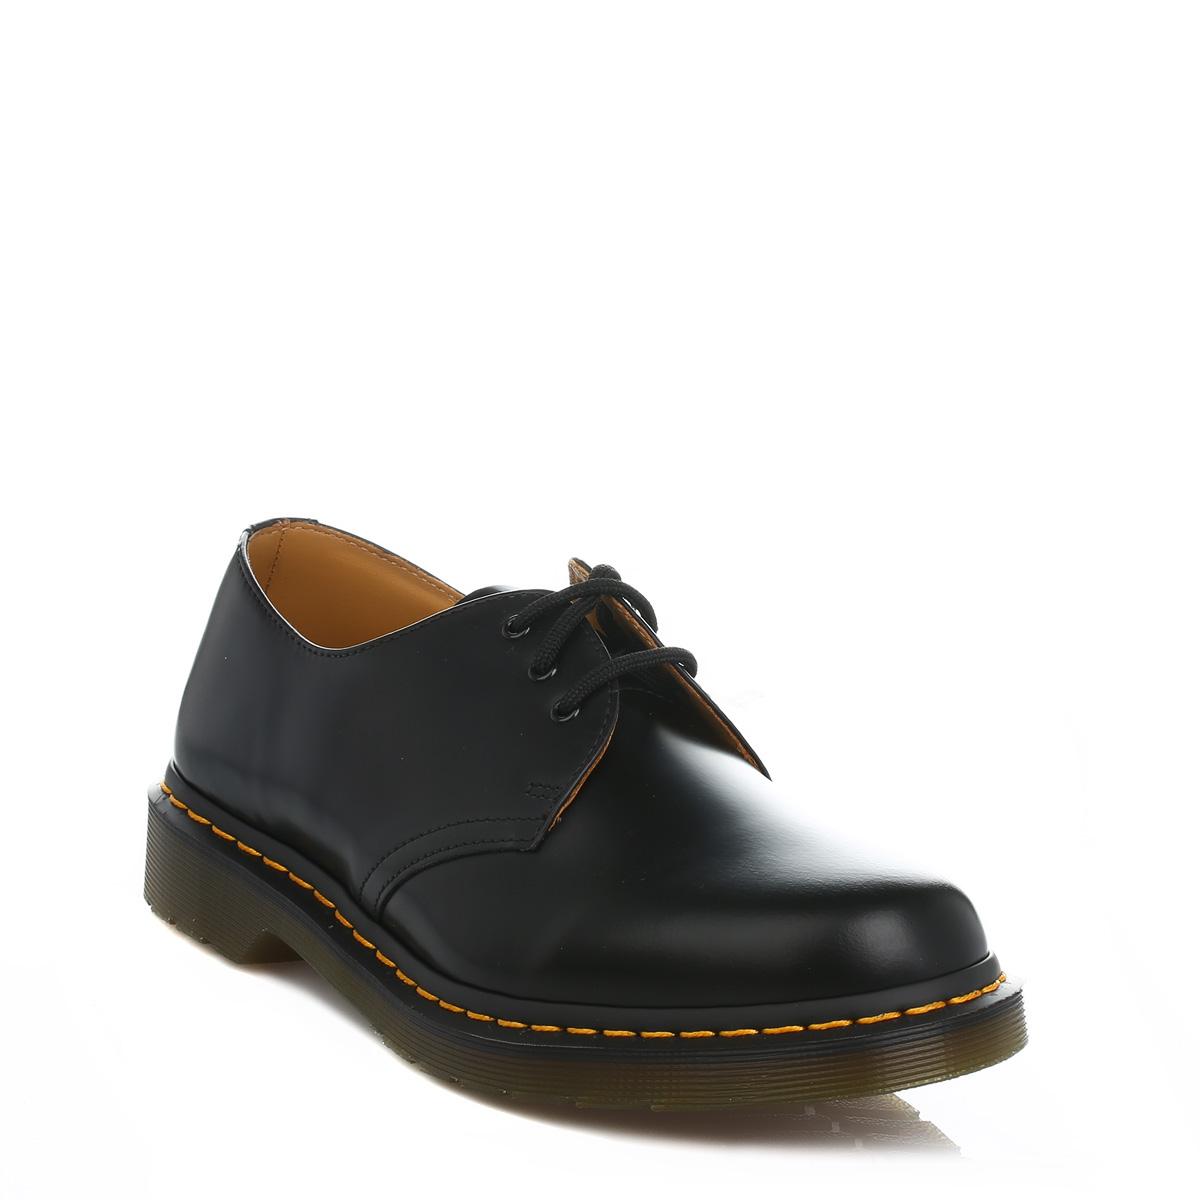 Dr-Martens-Noir-1461-Cuir-Lisse-Chaussures-a-lacets-Smart-Casual-Style